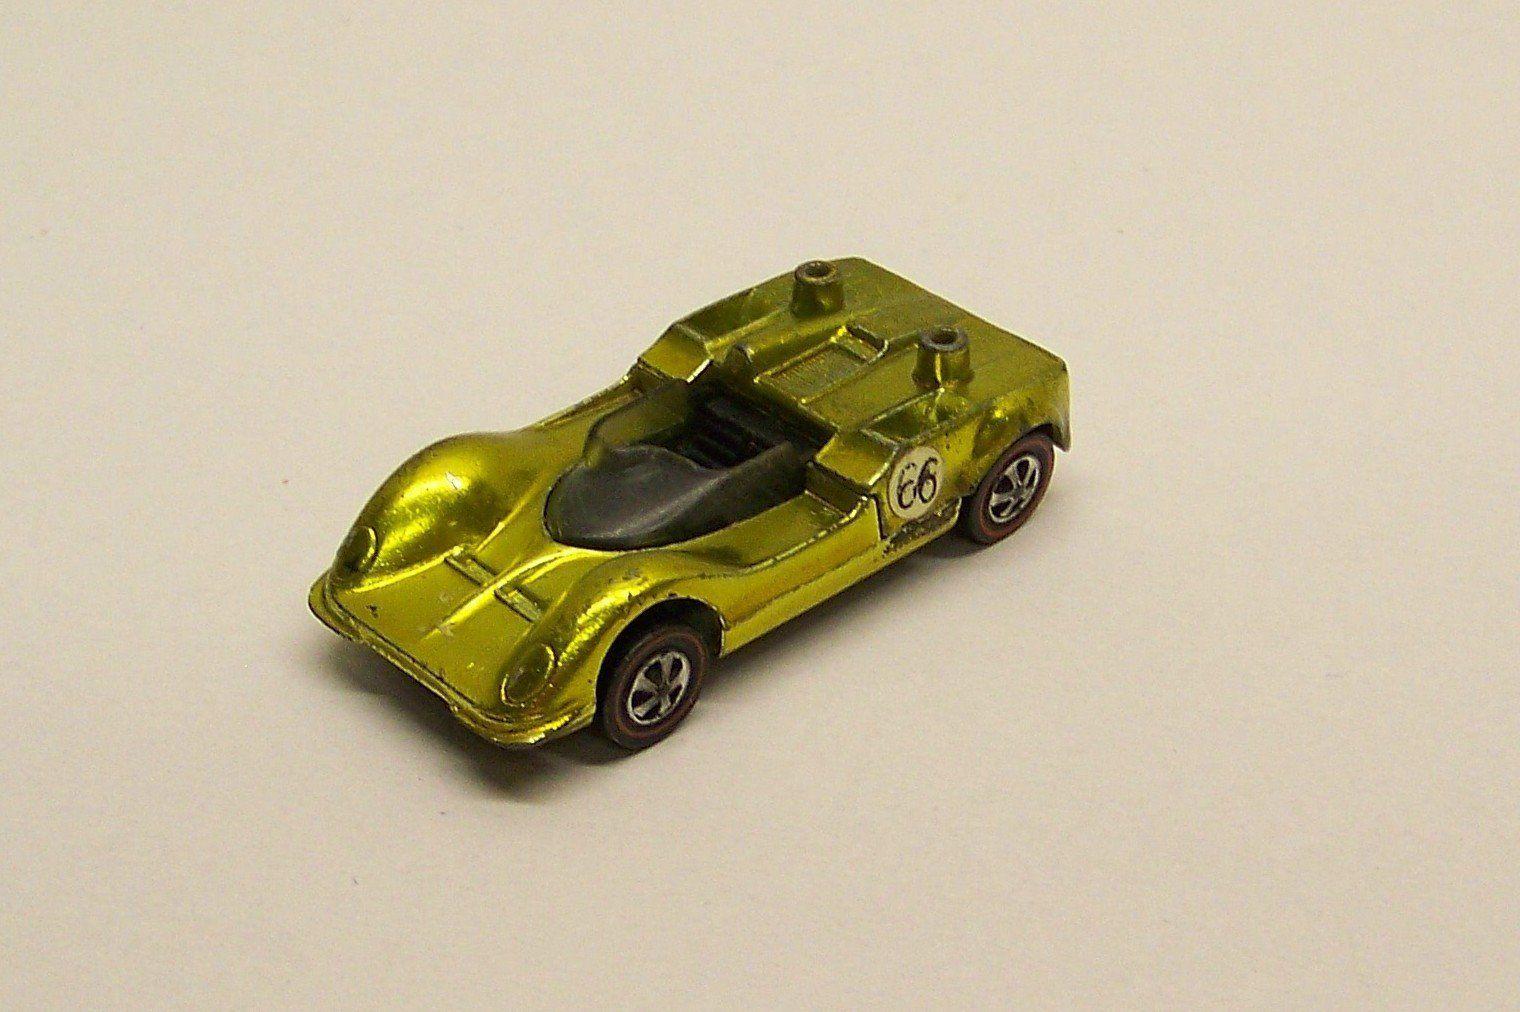 Hotwheels Redline gold/yellow Chaparral